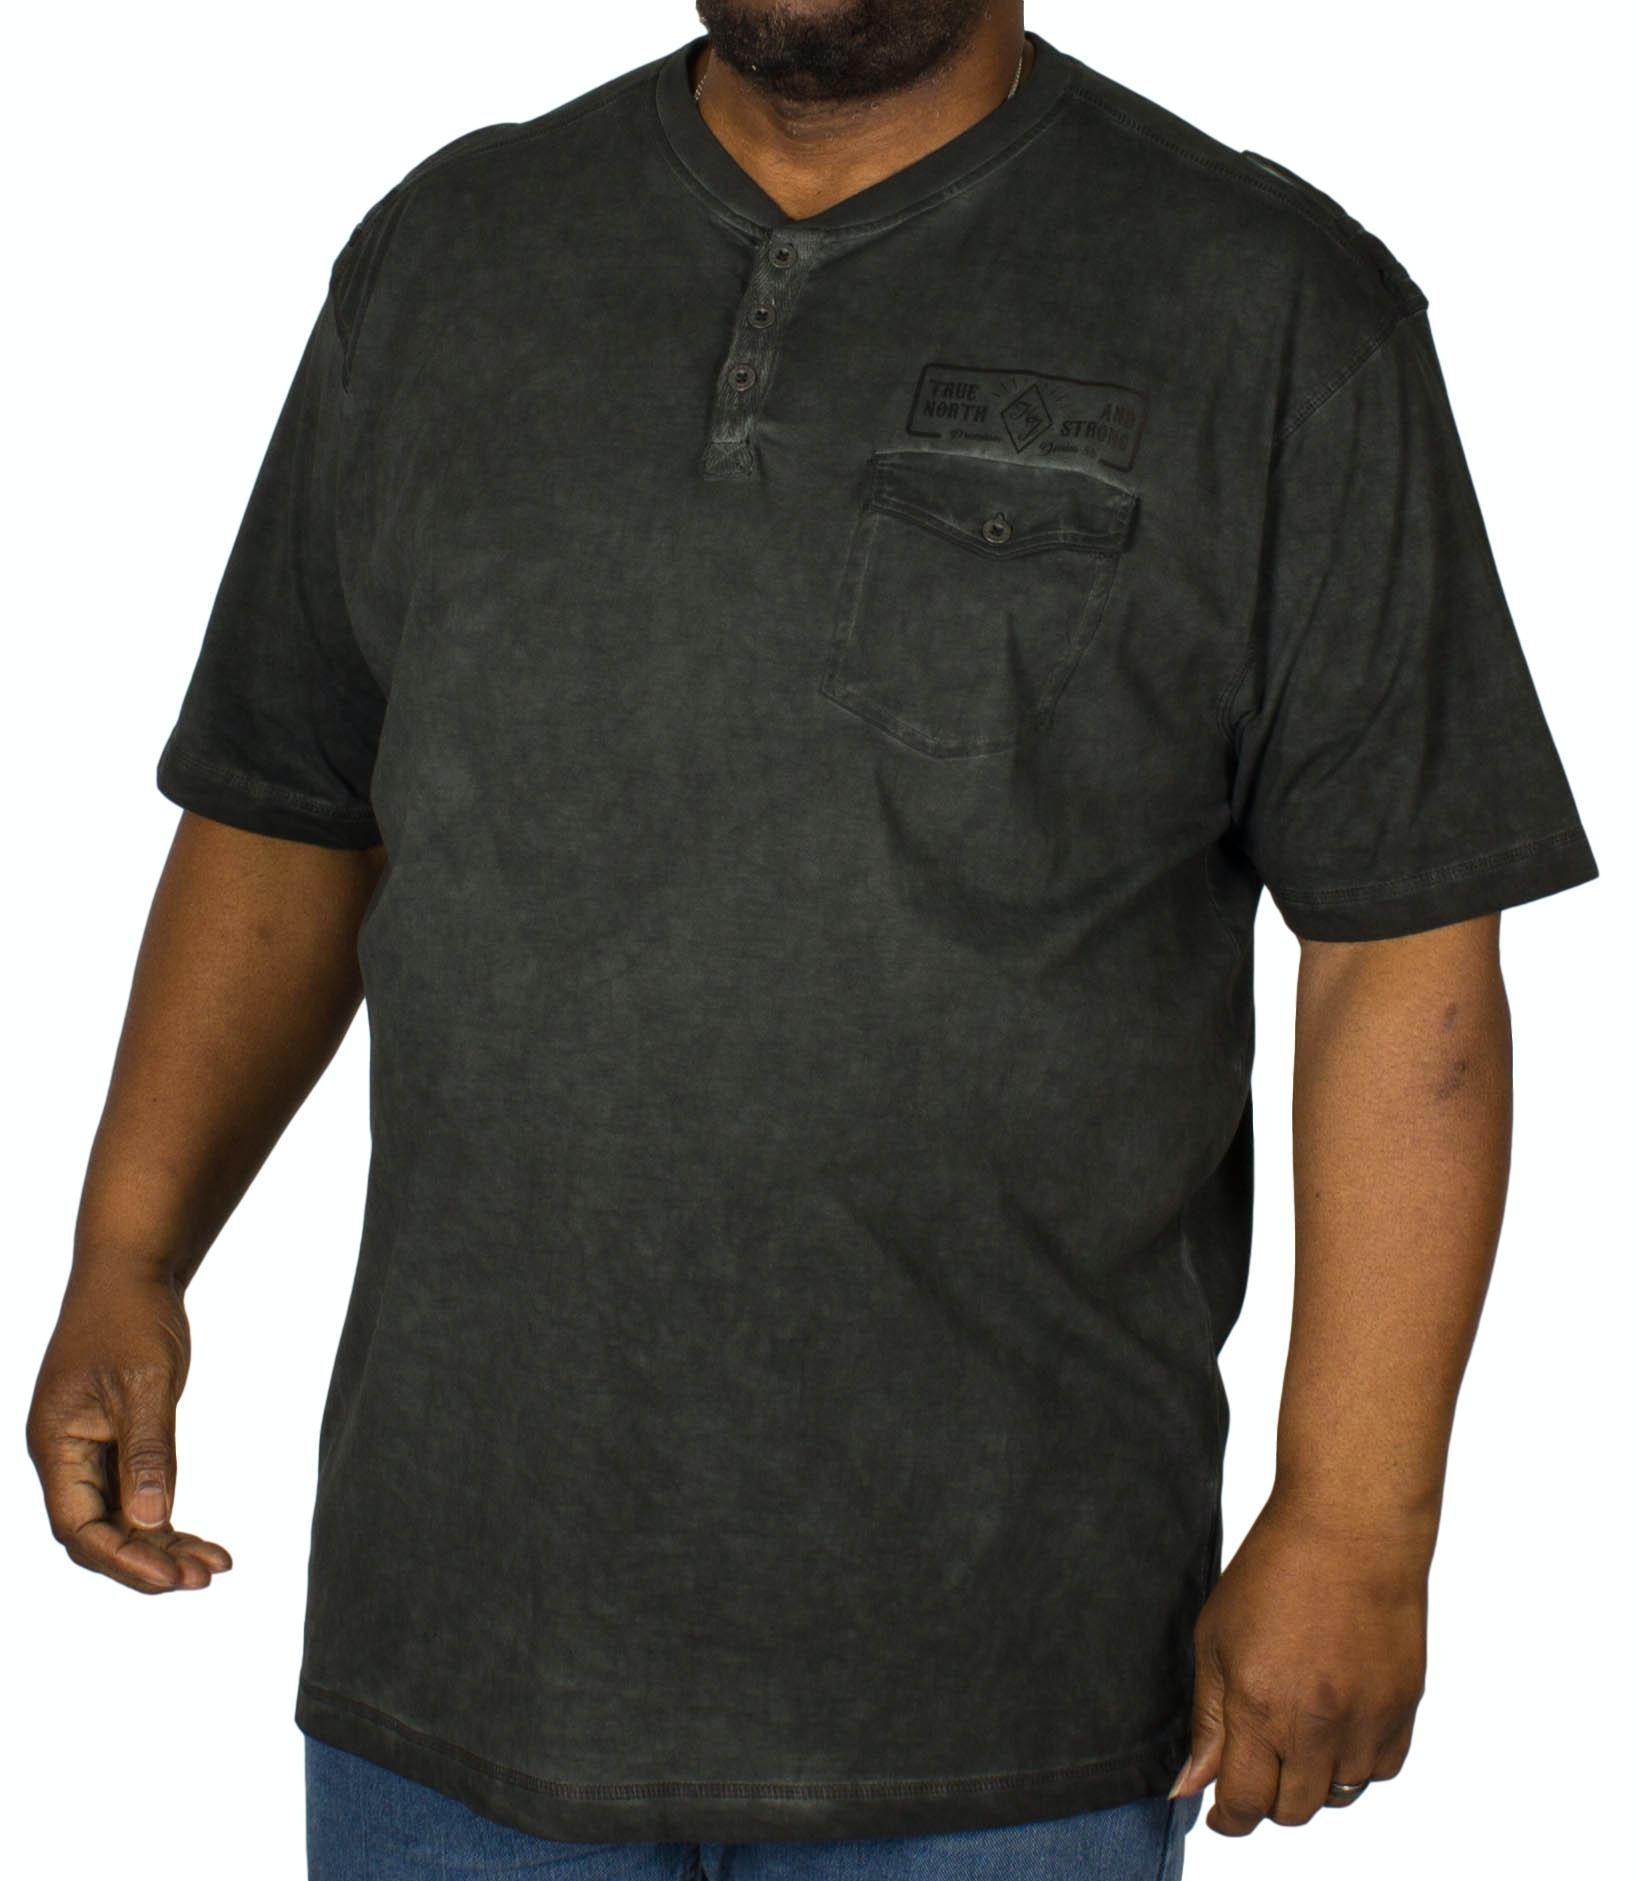 KAM Button Acid Wash T-Shirt Black